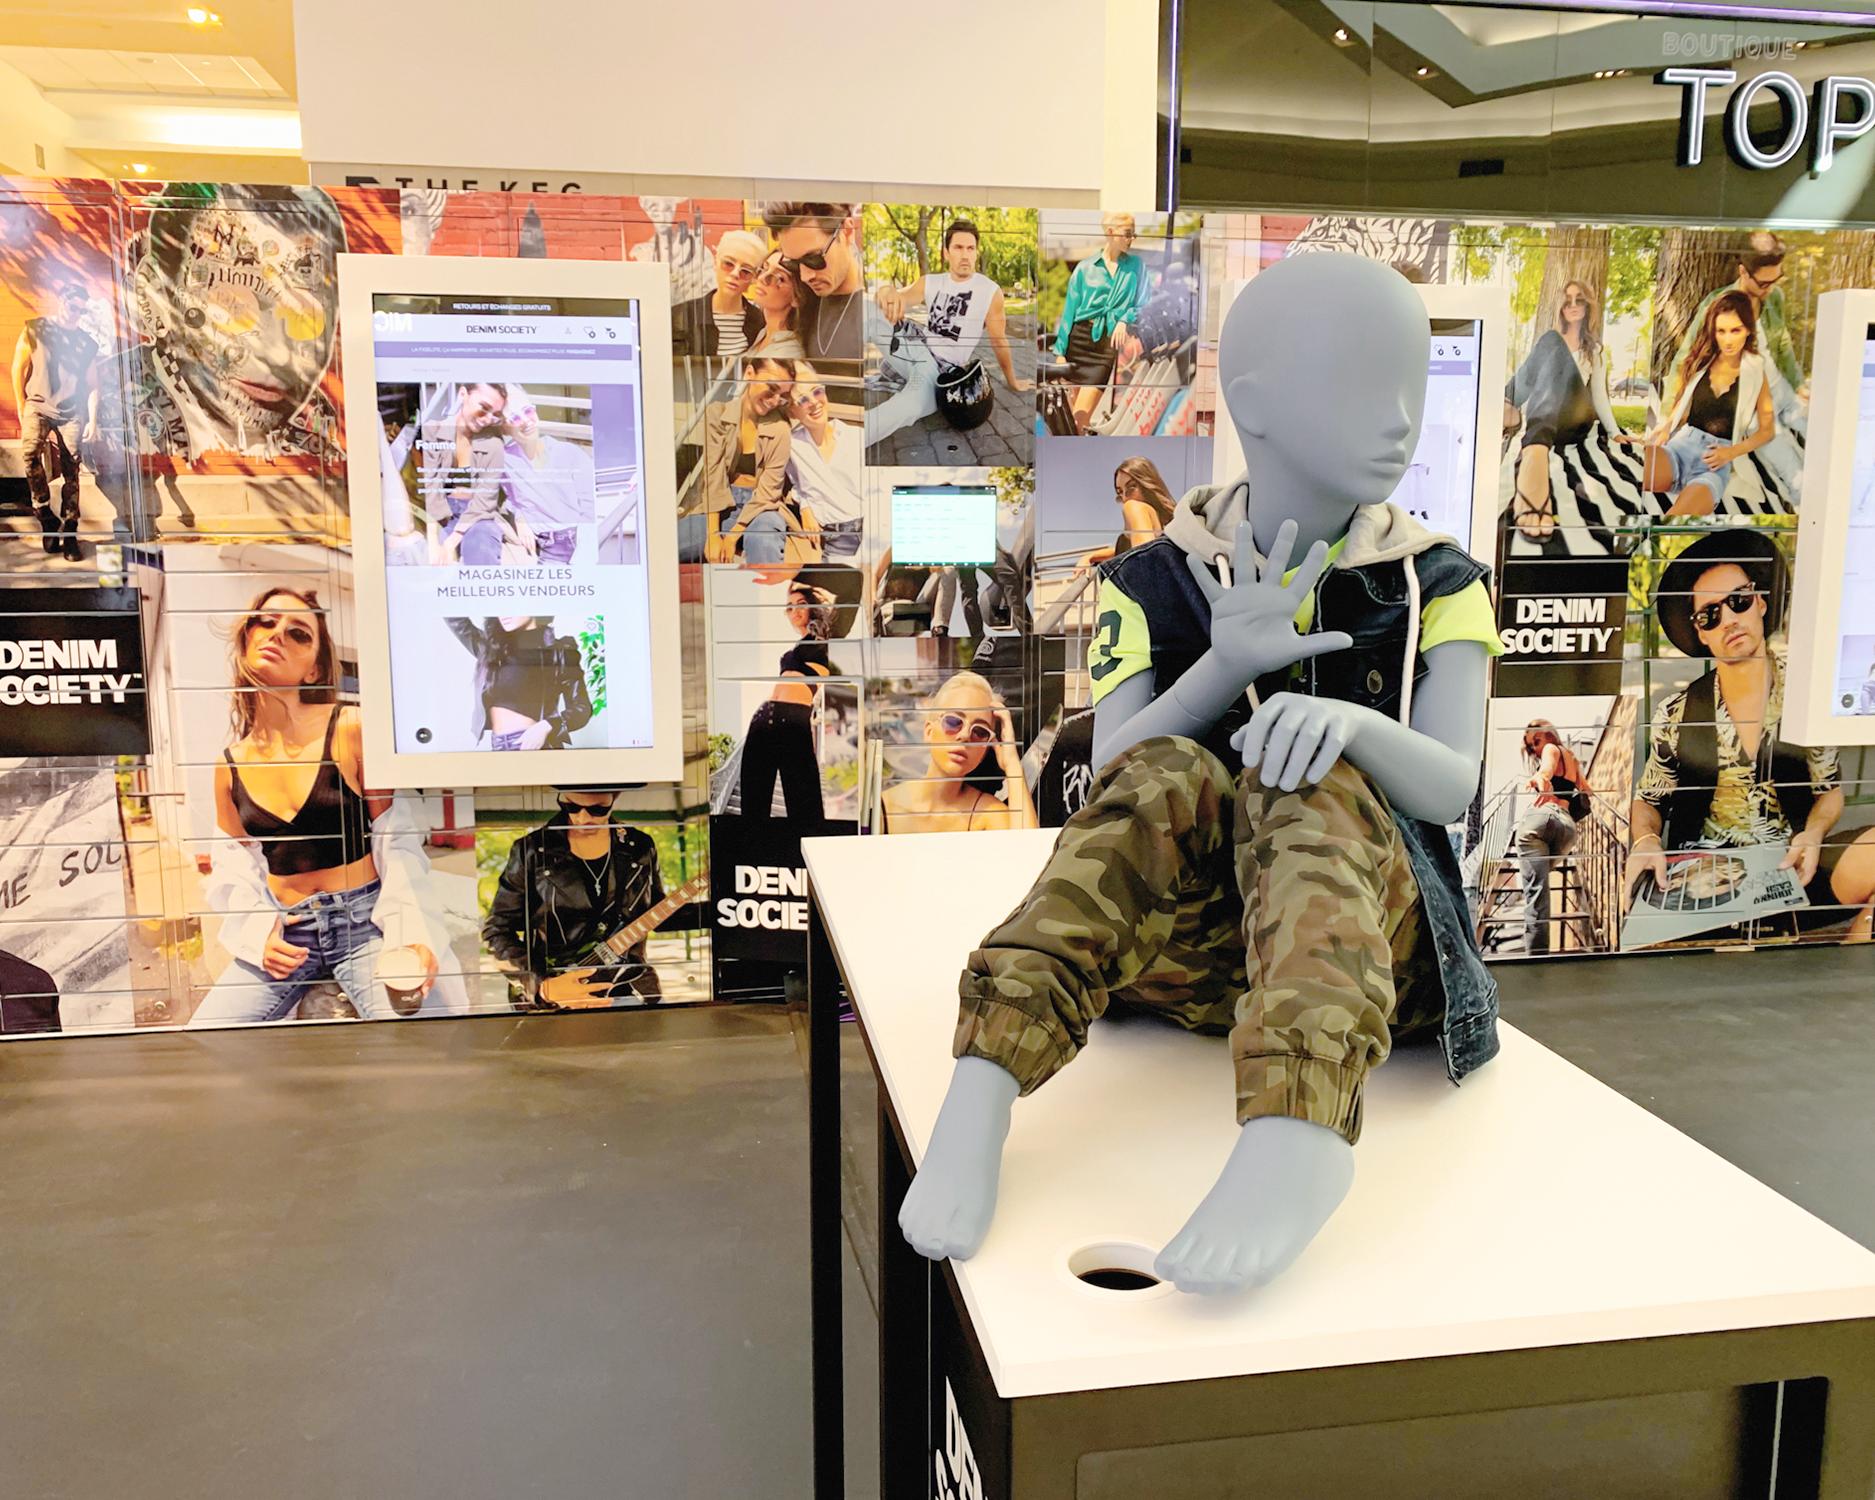 Denim Society Smart Lockers - Mannequin (central)